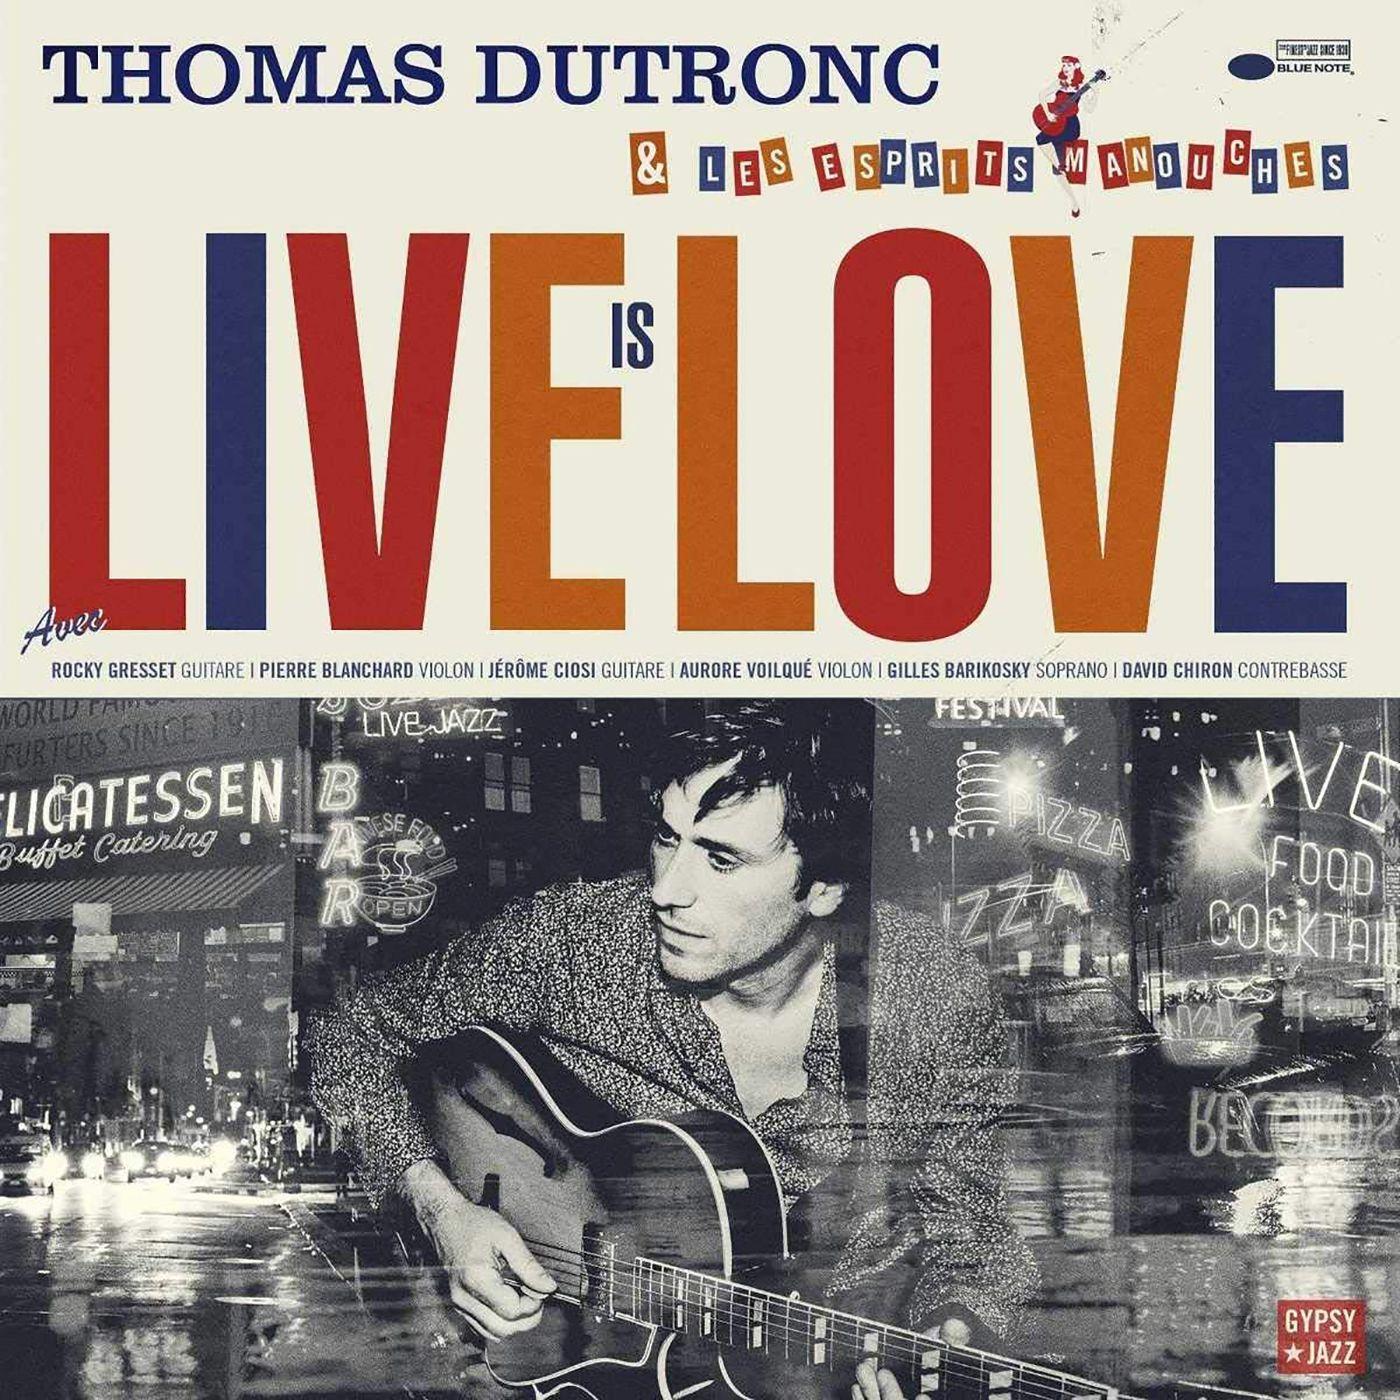 Thomas Dutronc - Live Is Love album cover